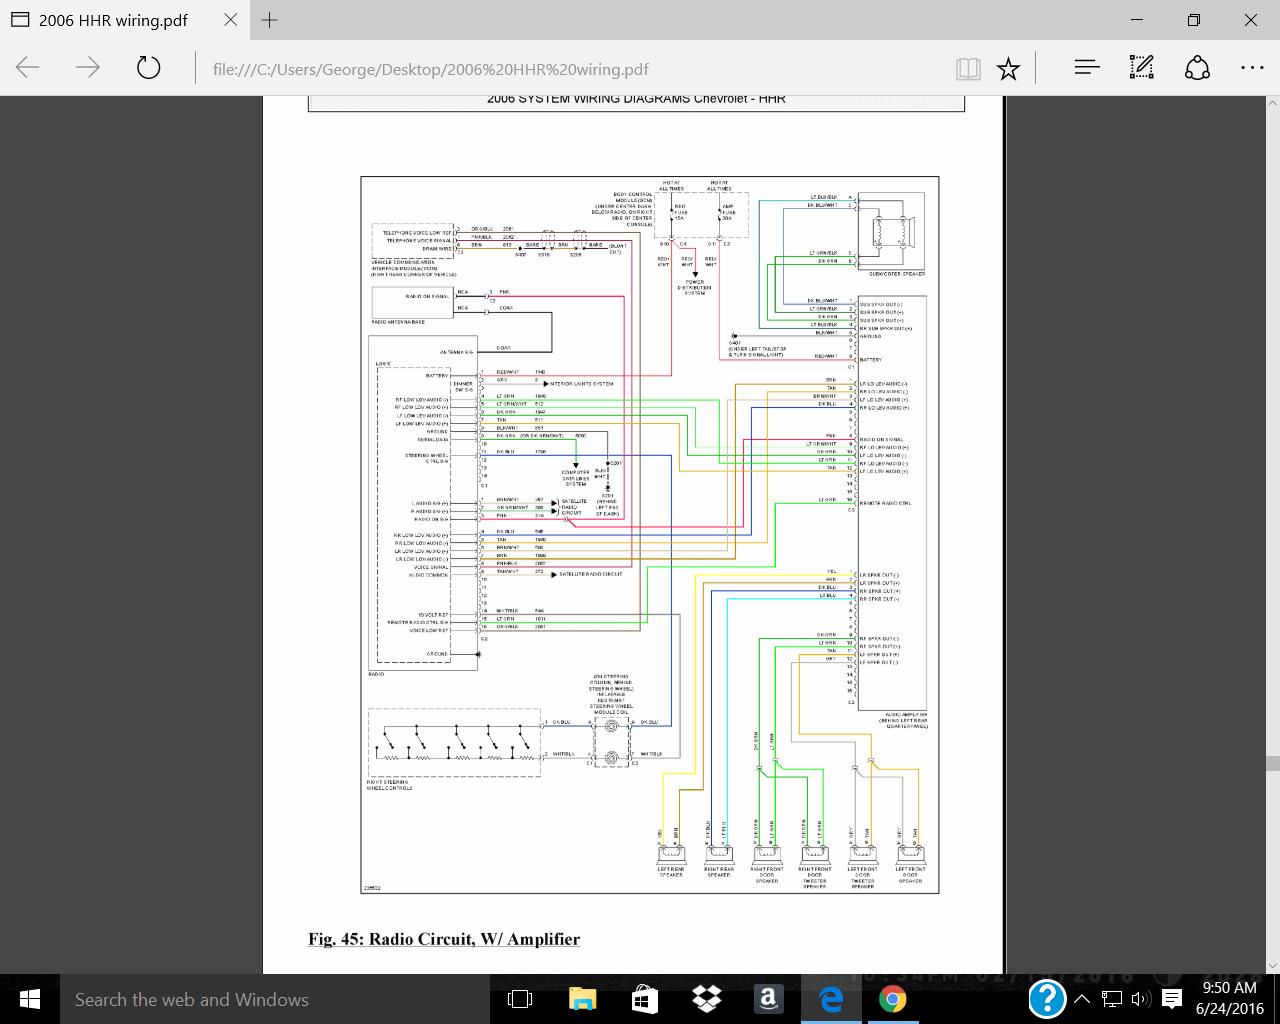 2002 Isuzu Axiom Engine Diagram besides 1990 Mitsubishi Eclipse Radio Wiring Diagram also Bmw Z3 Speaker Location additionally 2004 Bmw Z4 Fuse Box Diagram likewise Isuzu Truck Radio Wiring Diagram Html. on 84200 how to upgrade sound system 4